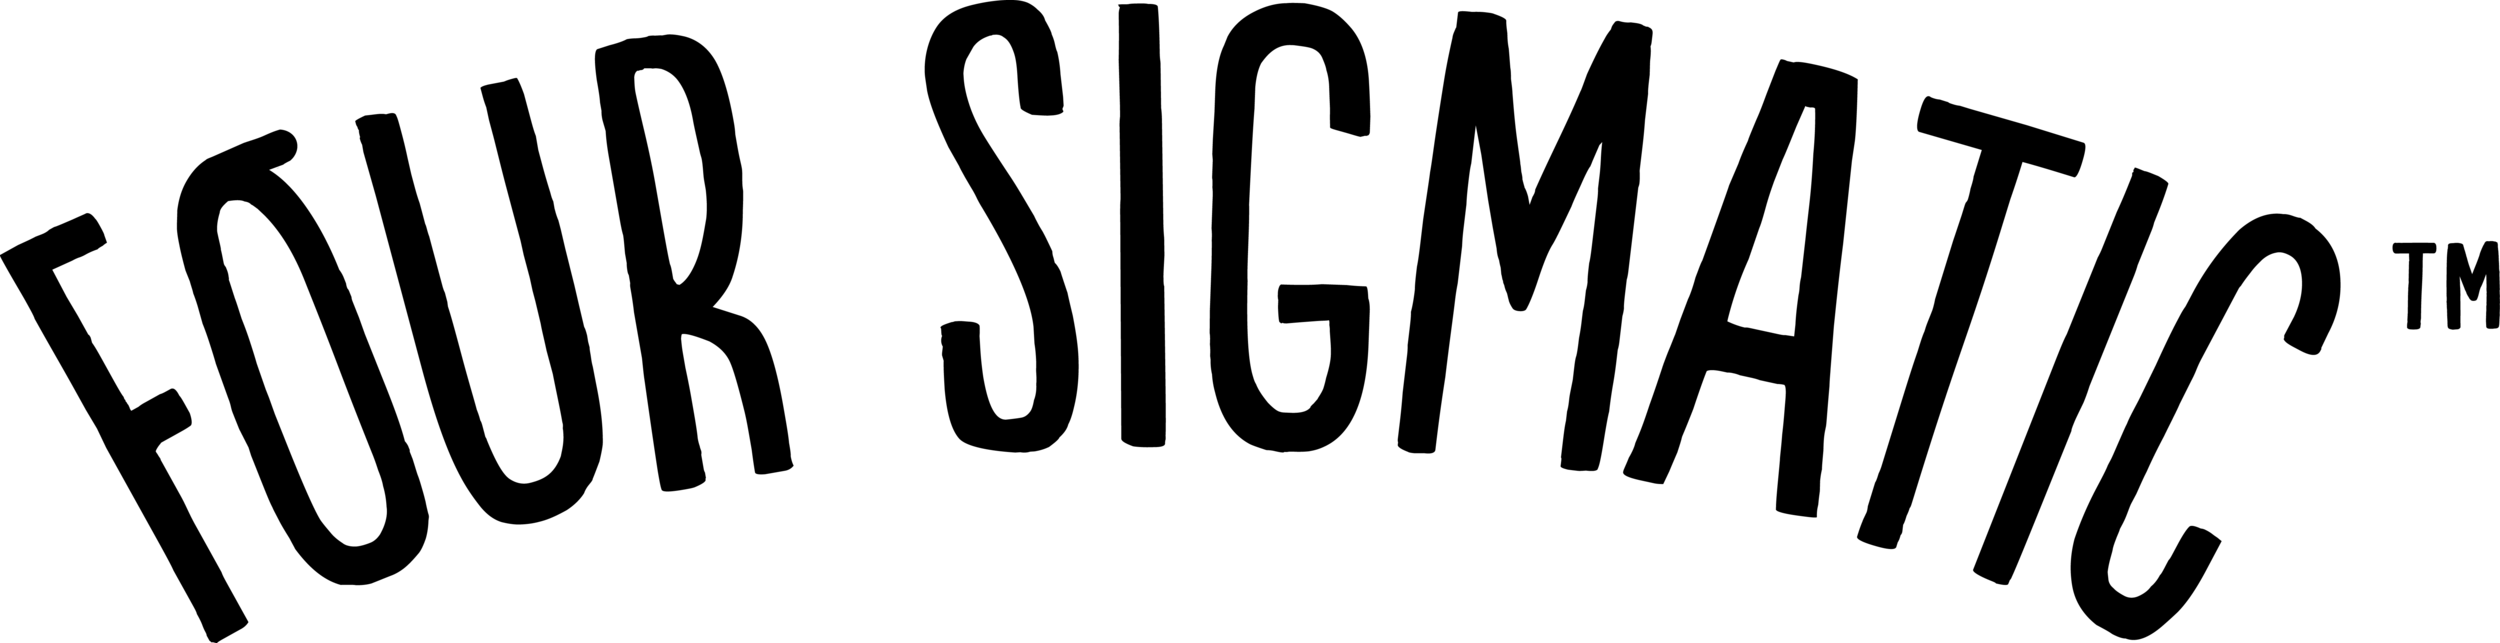 foursigmatic_logo_black.png